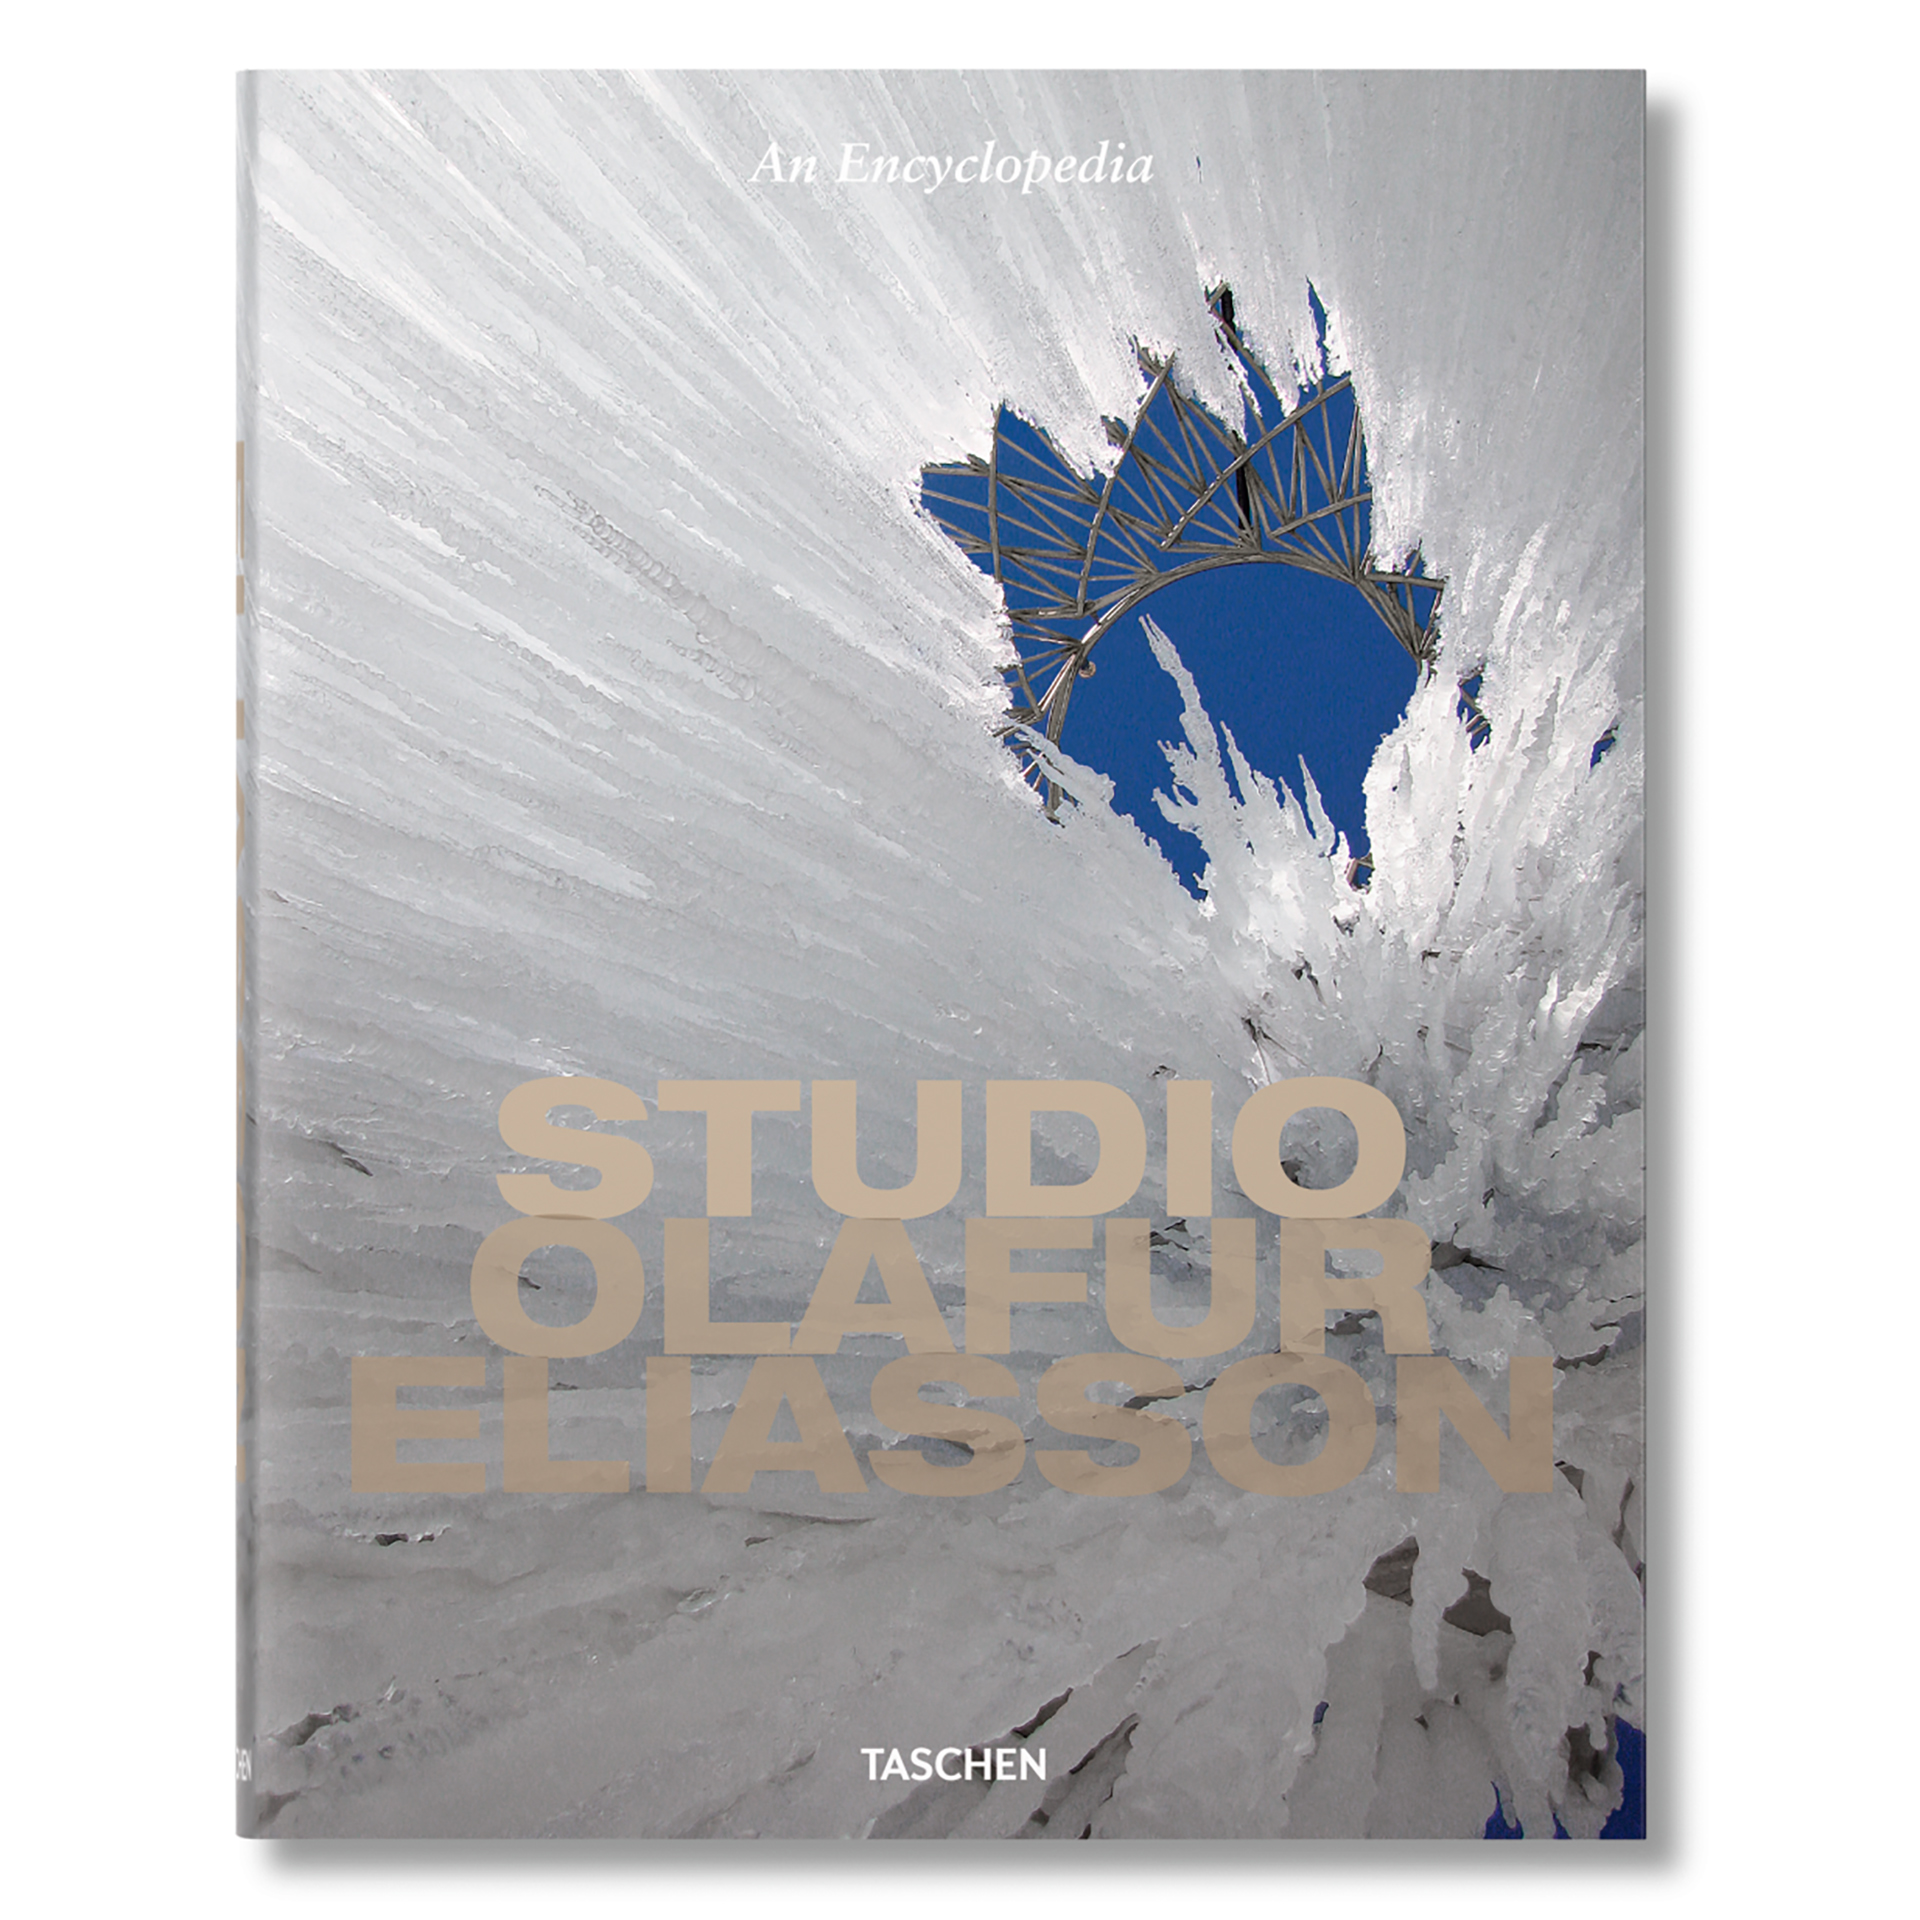 An Encyclopedia - Studio Olafur Eliasson - R1150.jpg